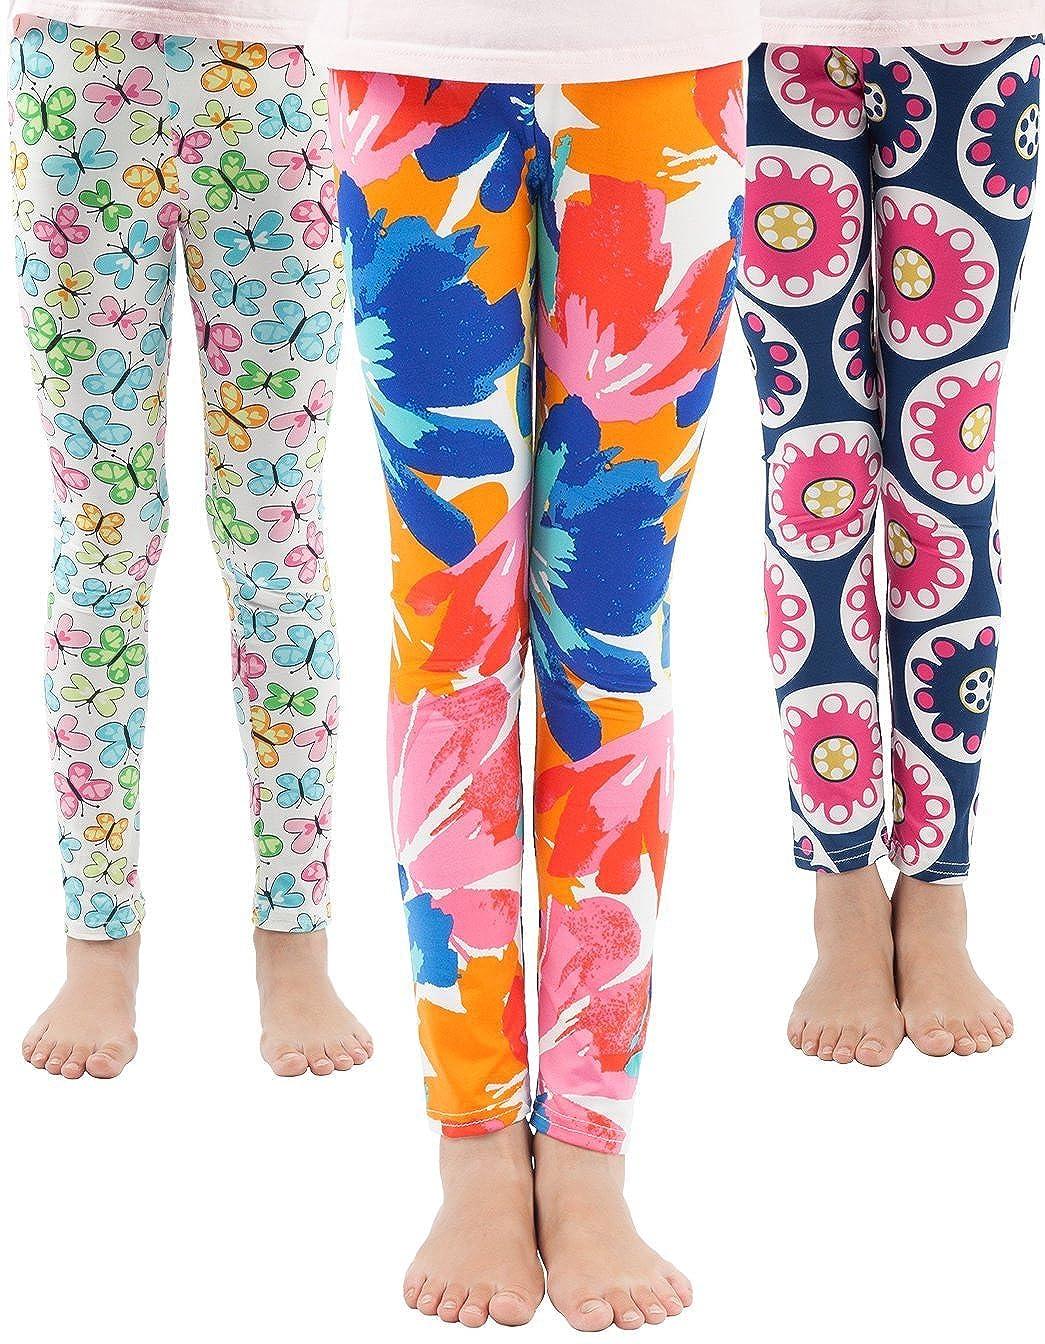 WEWINK PLUS Girls Toddler Leggings Pants 3 Pack Stretchy Printing Flower Classic Leggings for Kids